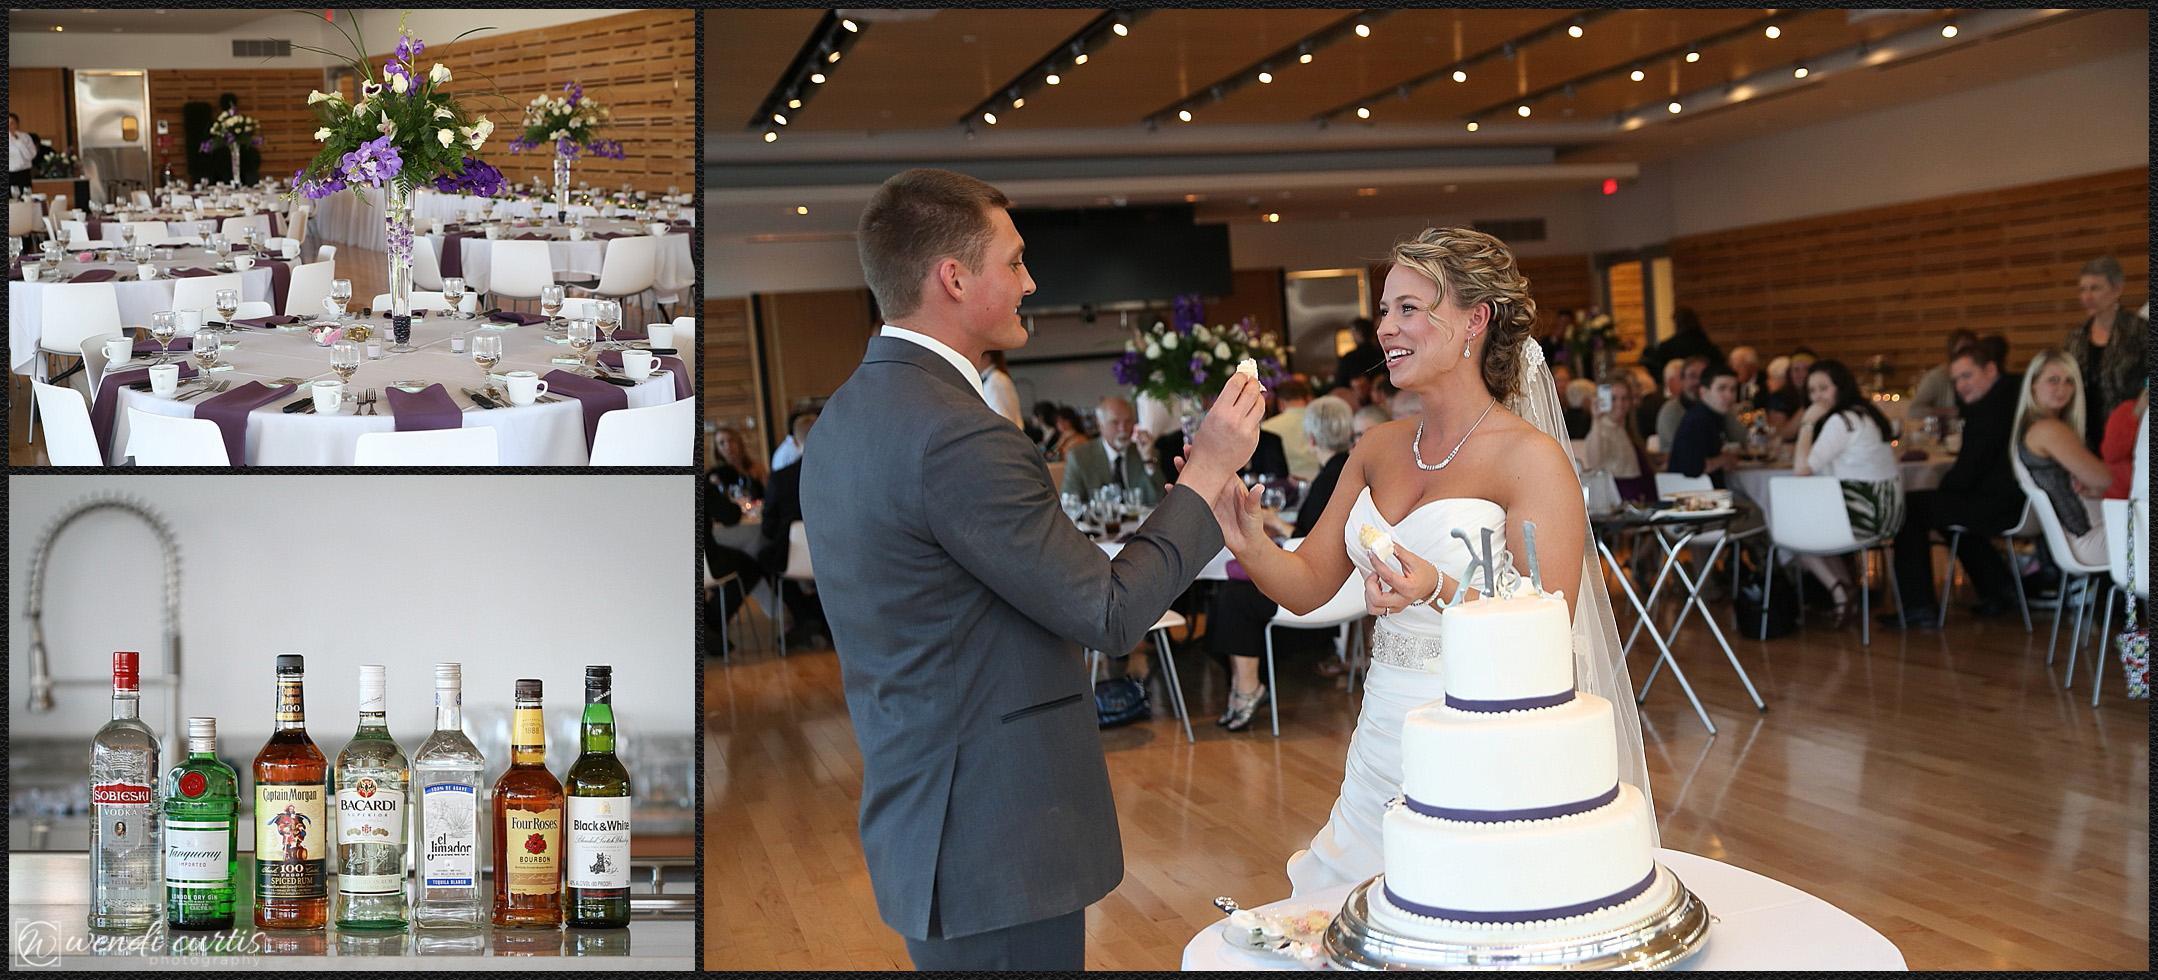 Downtown Market Wedding Reception 2017 03 31 0139 Grand Rapids